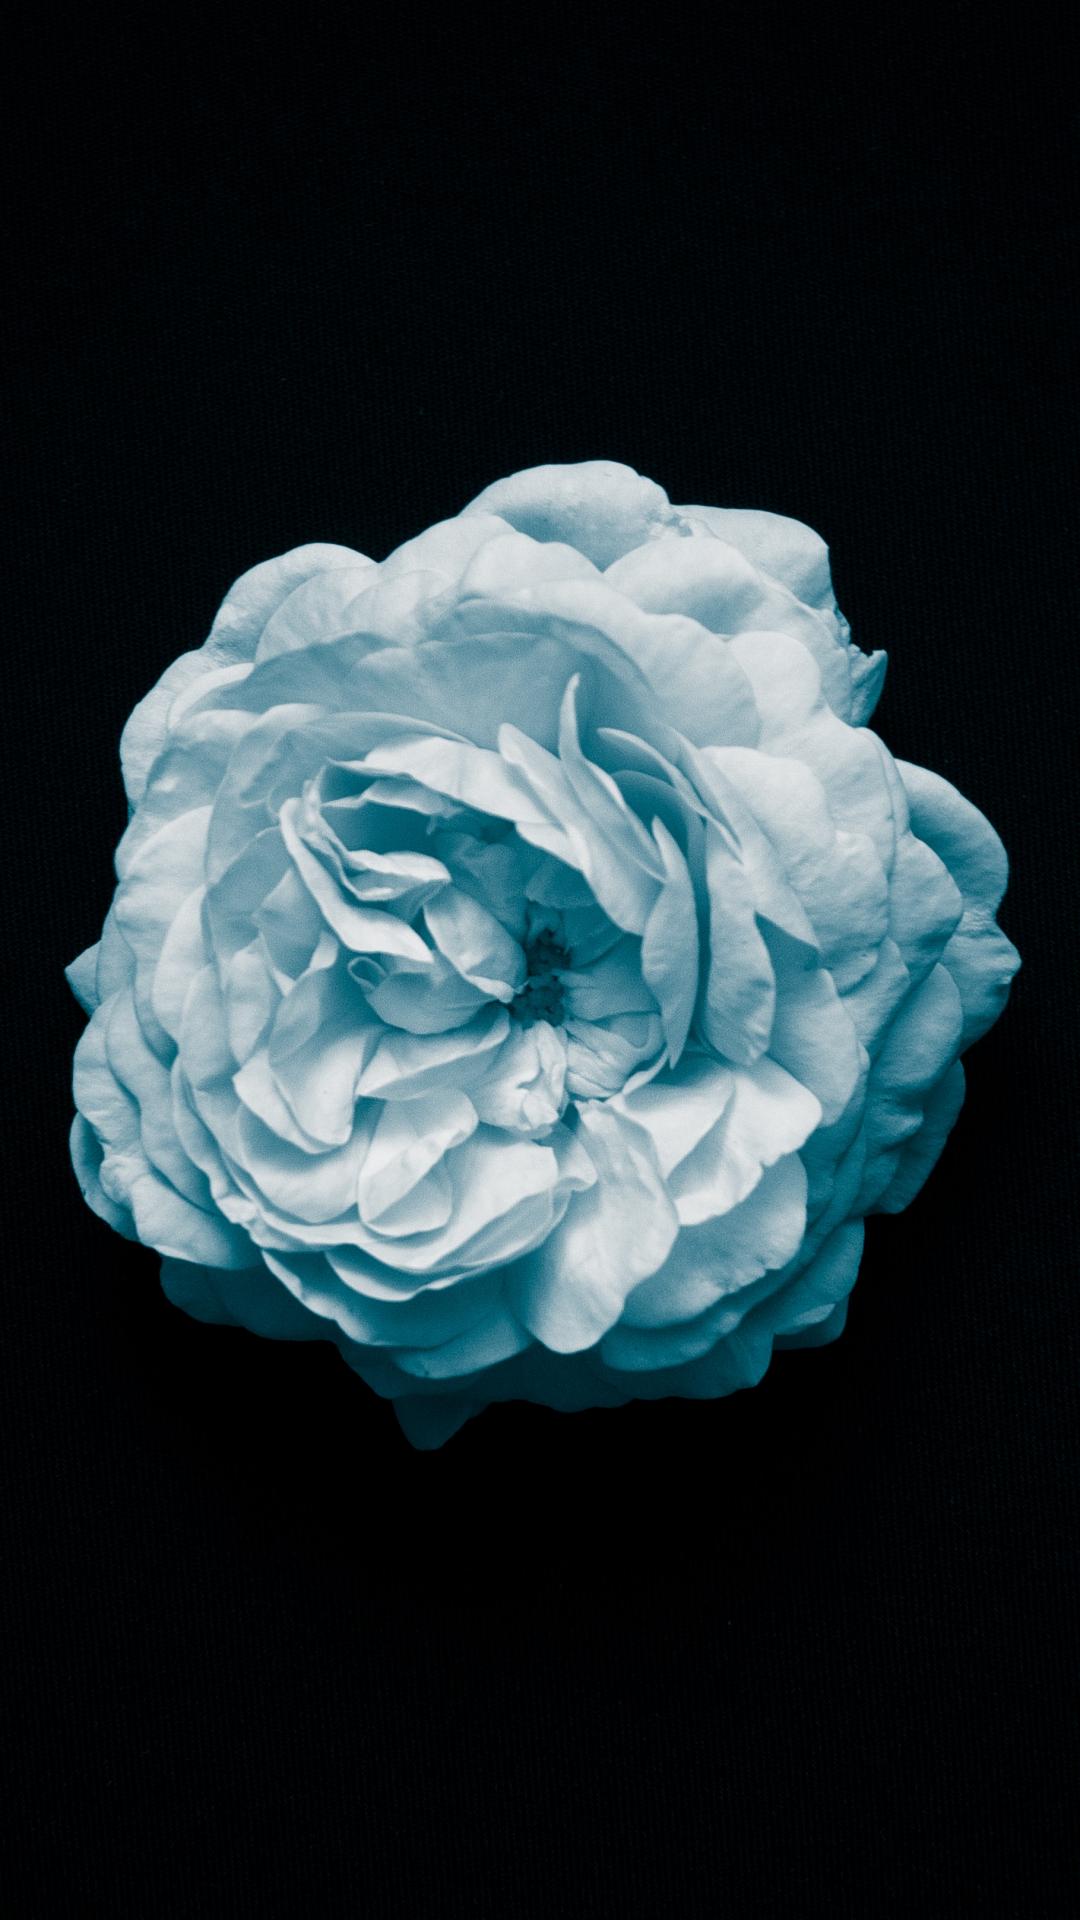 Flower, White, Macro, Minimalism iPhone Wallpaper